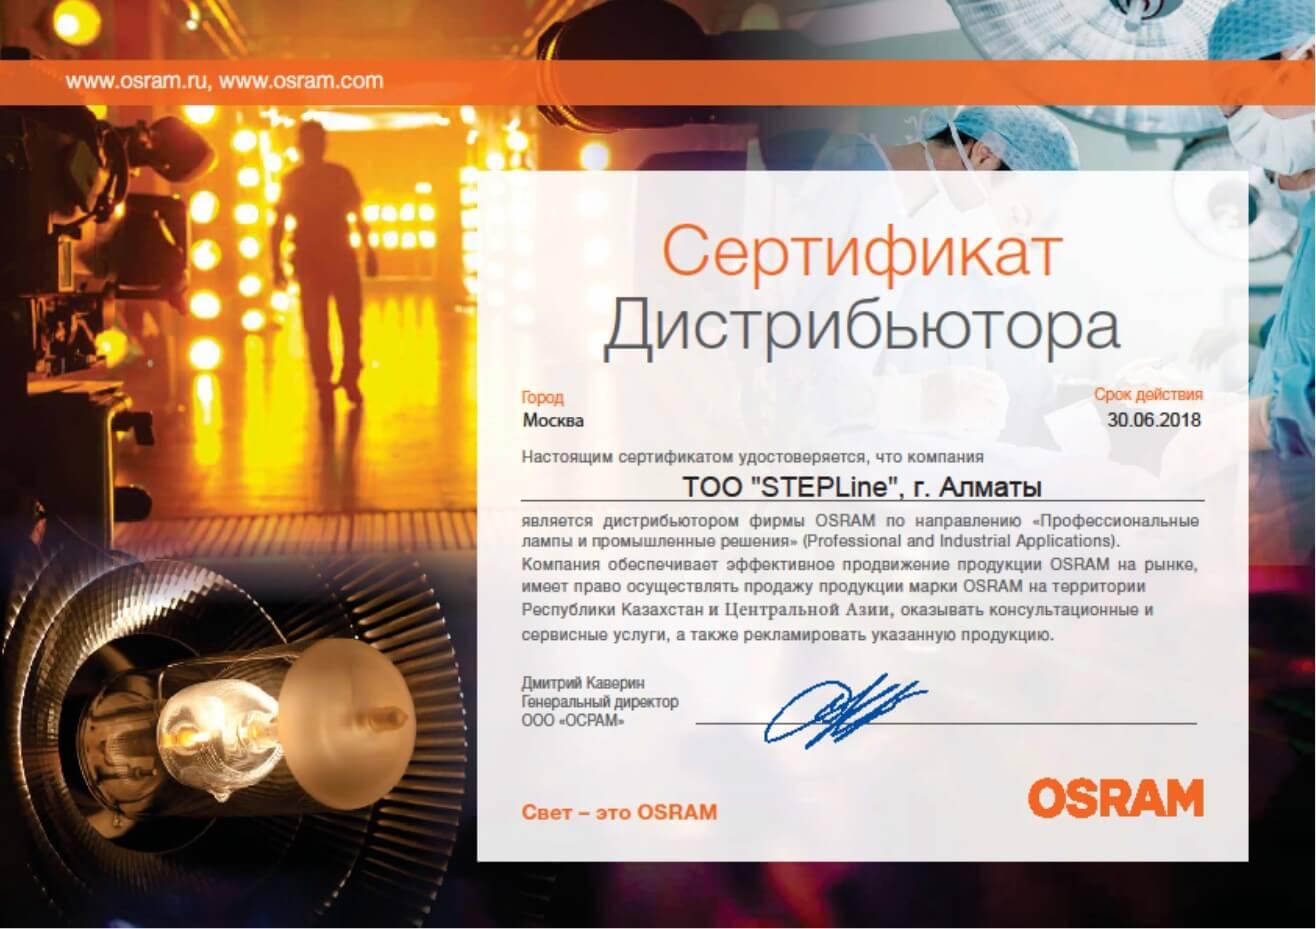 Сертификат дистрибьютера Osram DO